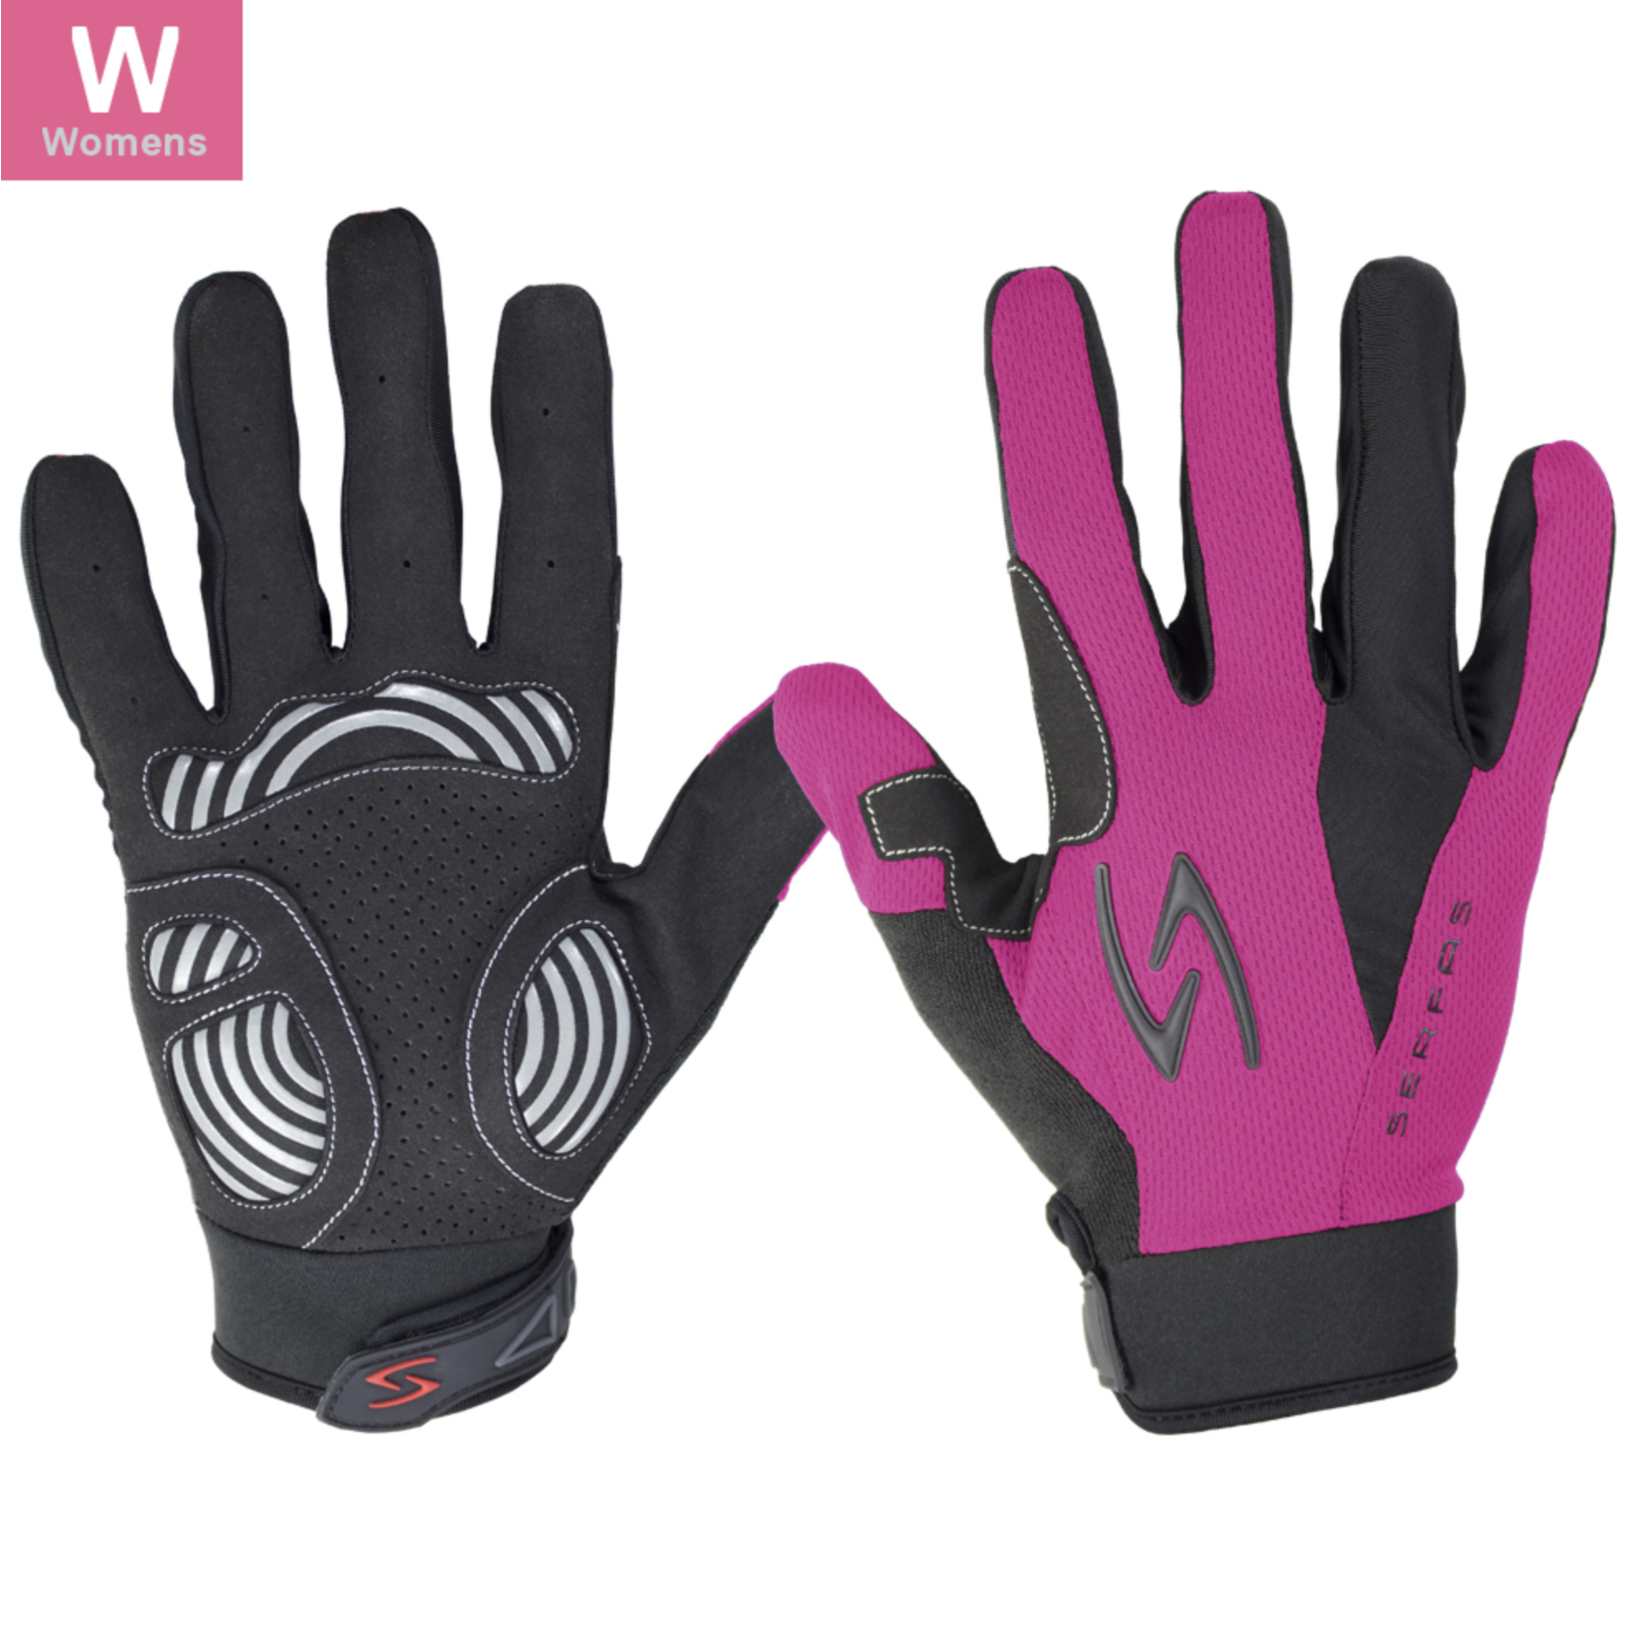 SERFAS ZEN Long Finger Gloves ZLW-PK-2 Pink Womens MD (SERFAS)